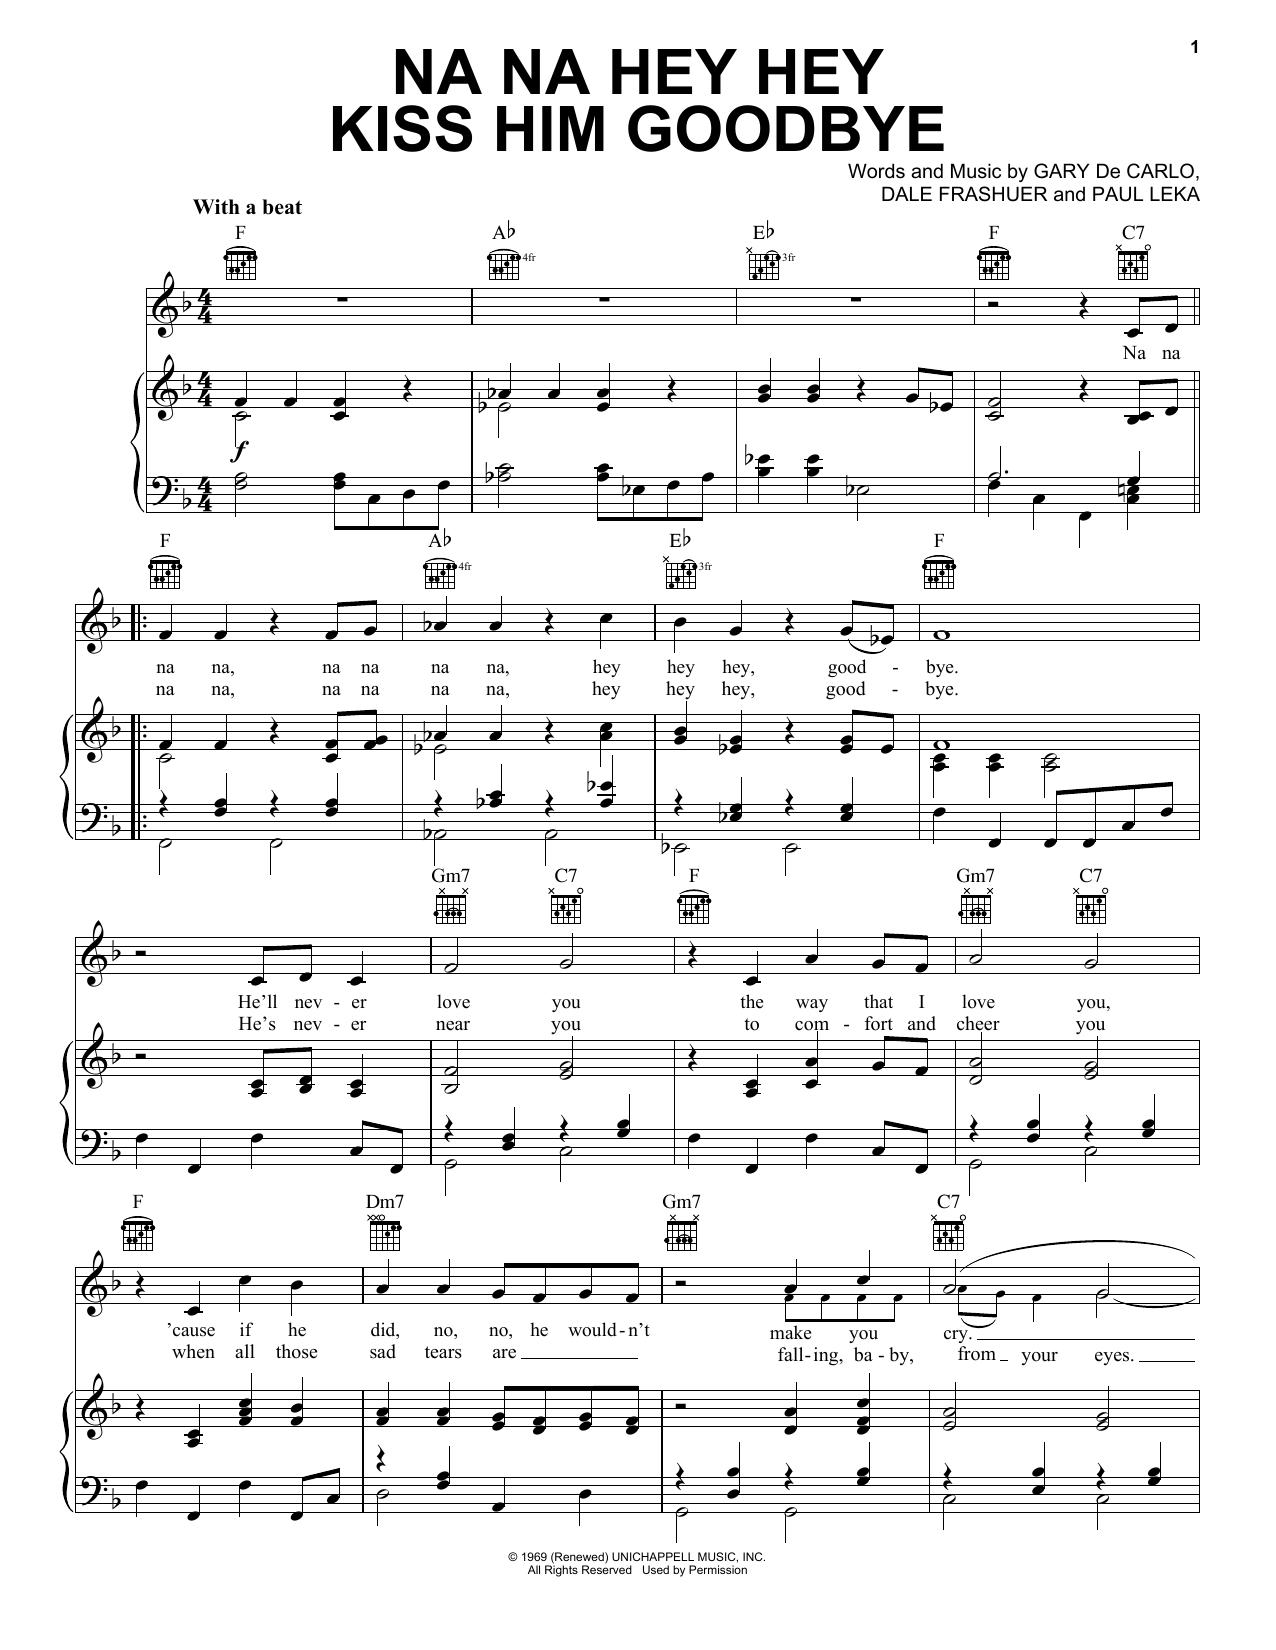 Steam Na Na Hey Hey Kiss Him Goodbye sheet music notes and chords